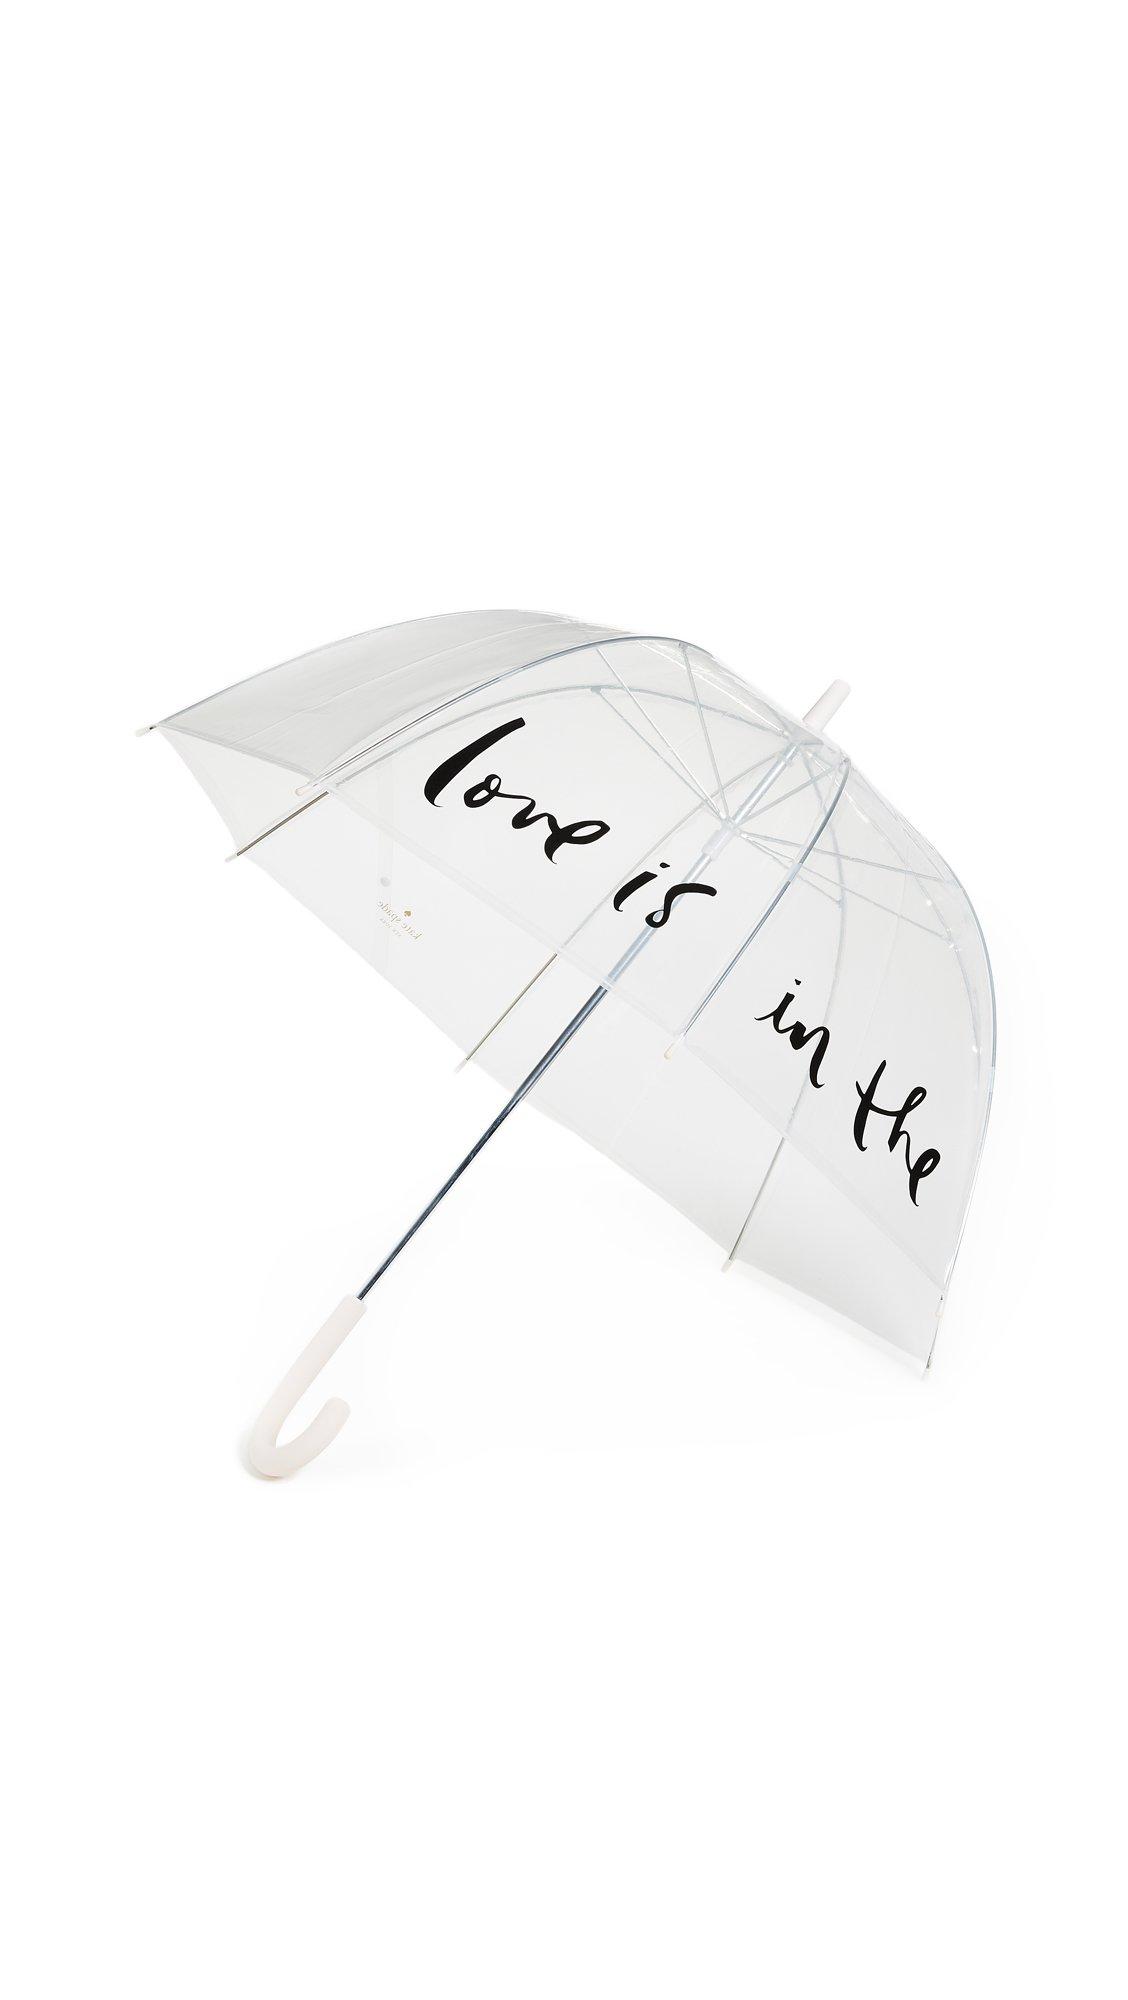 Kate Spade New York Umbrella